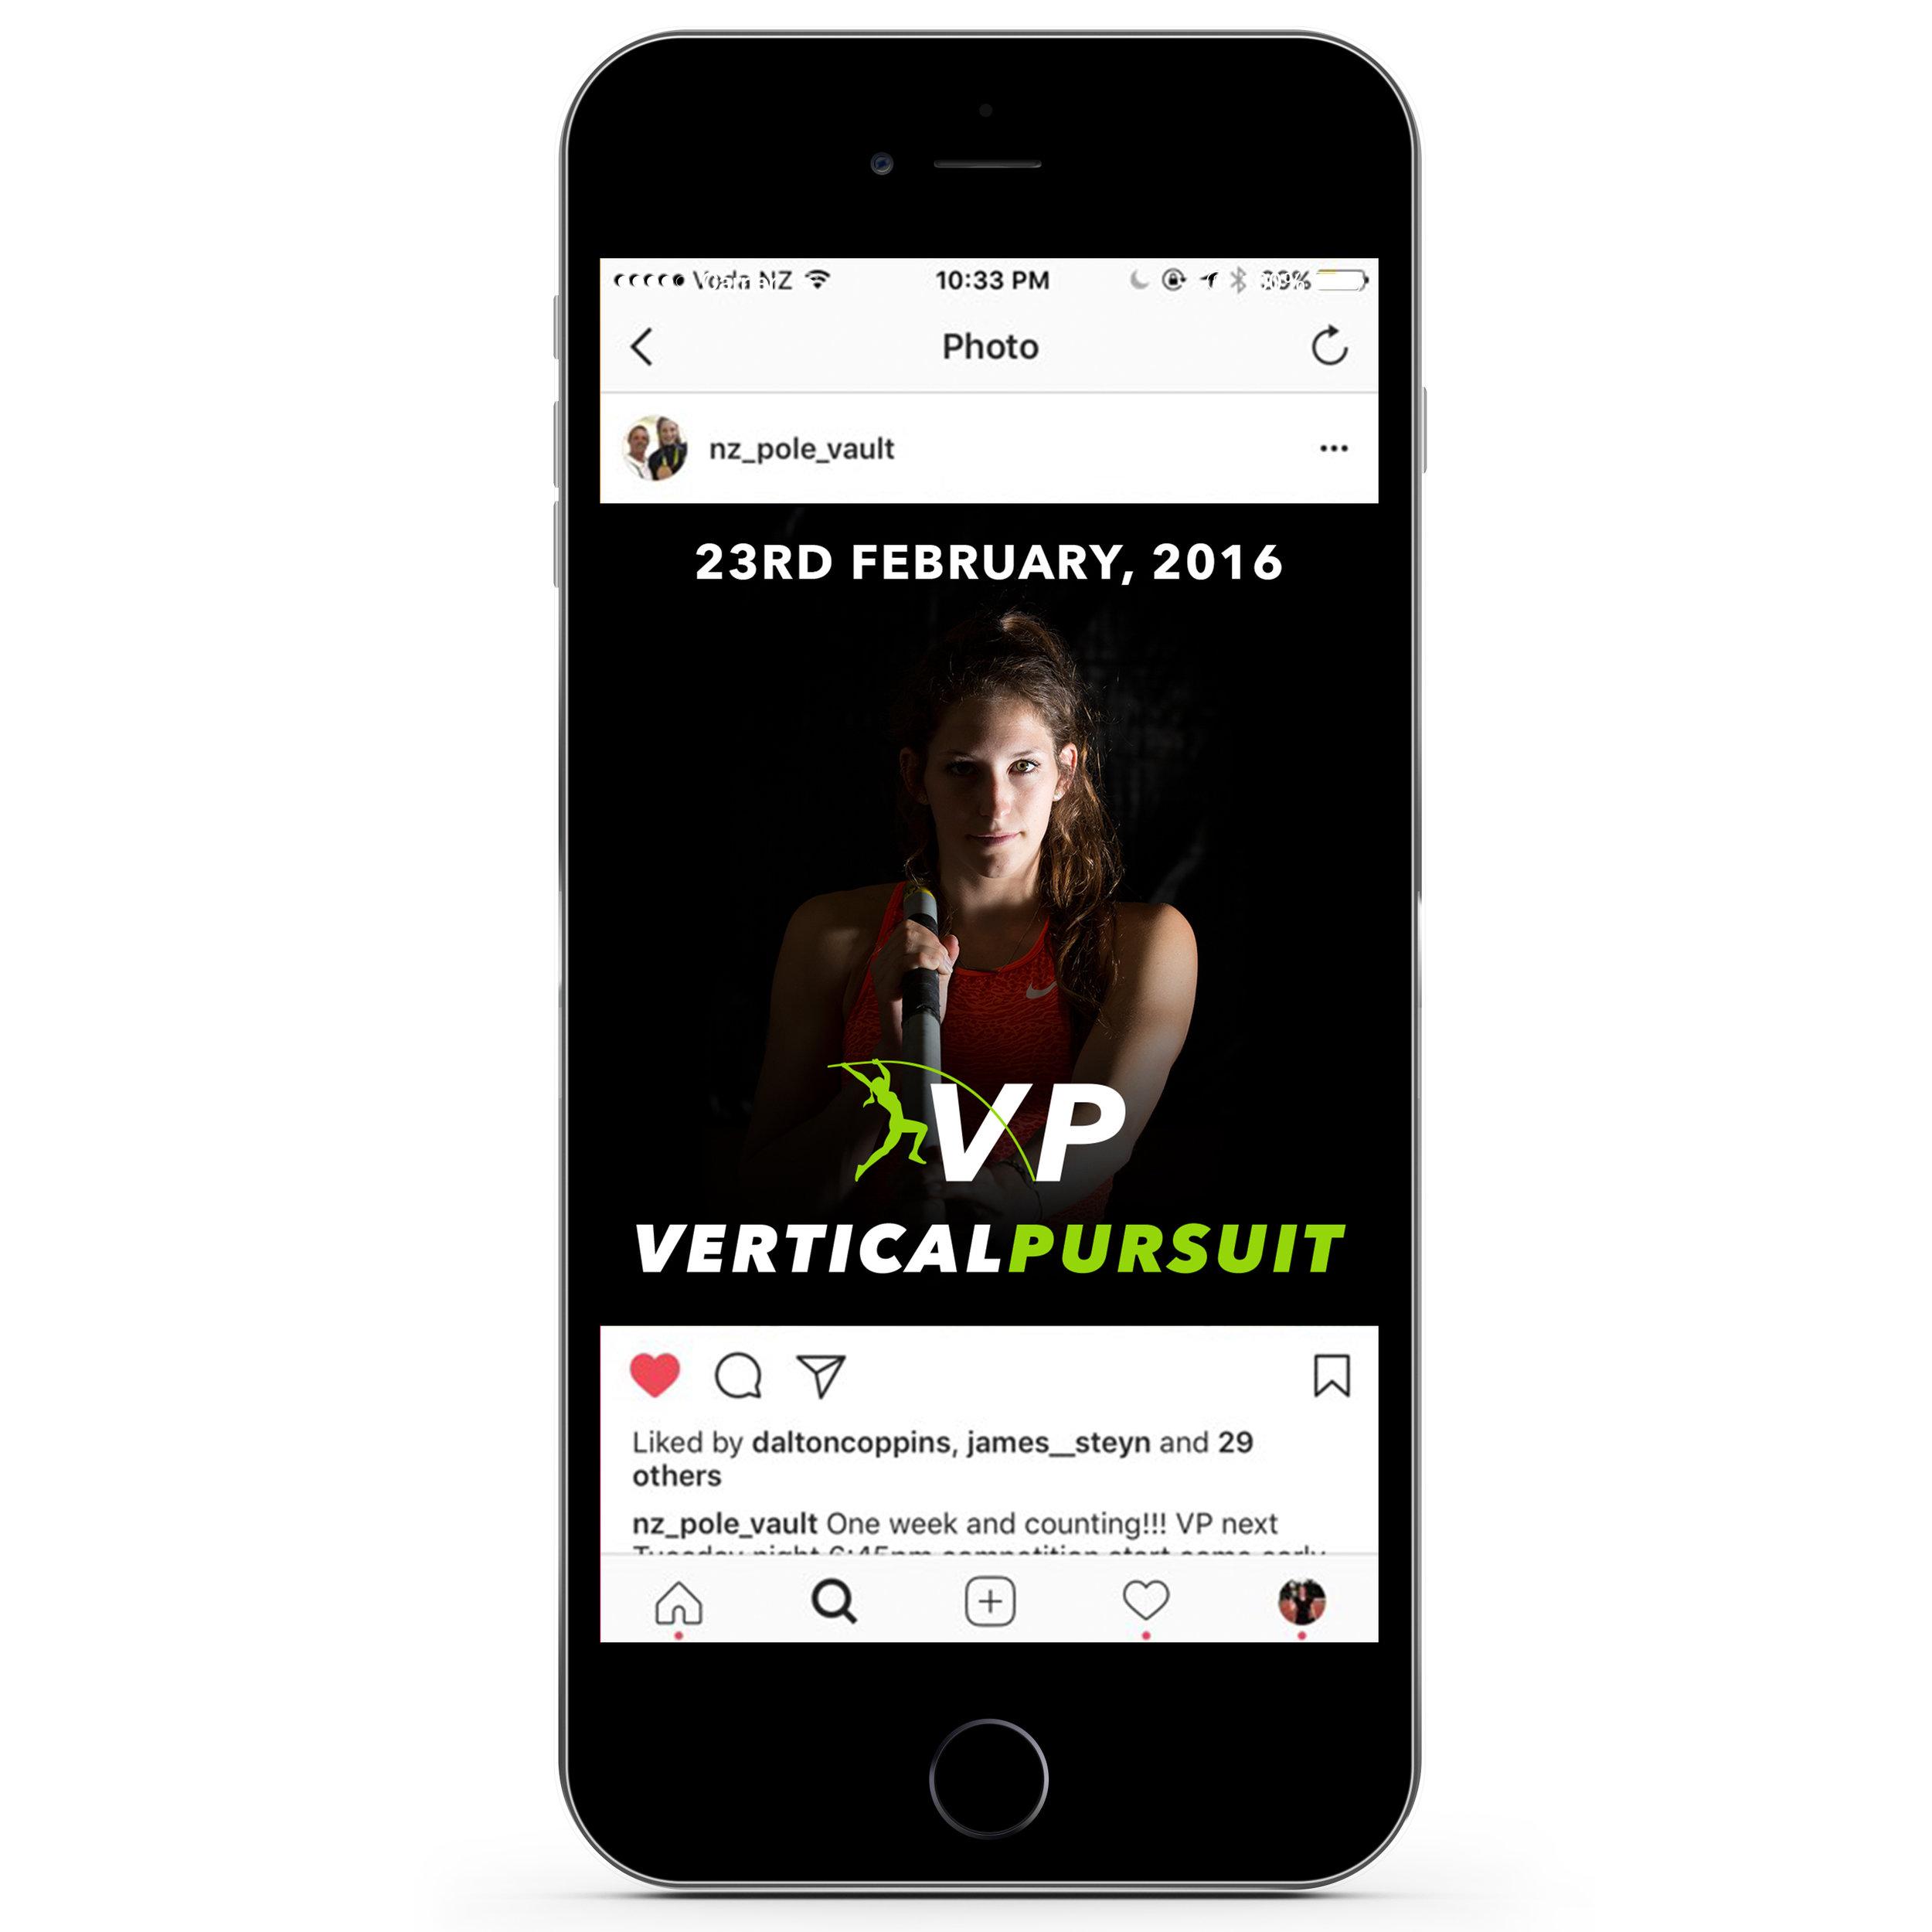 Instagram post by New Zealand Pole Vault